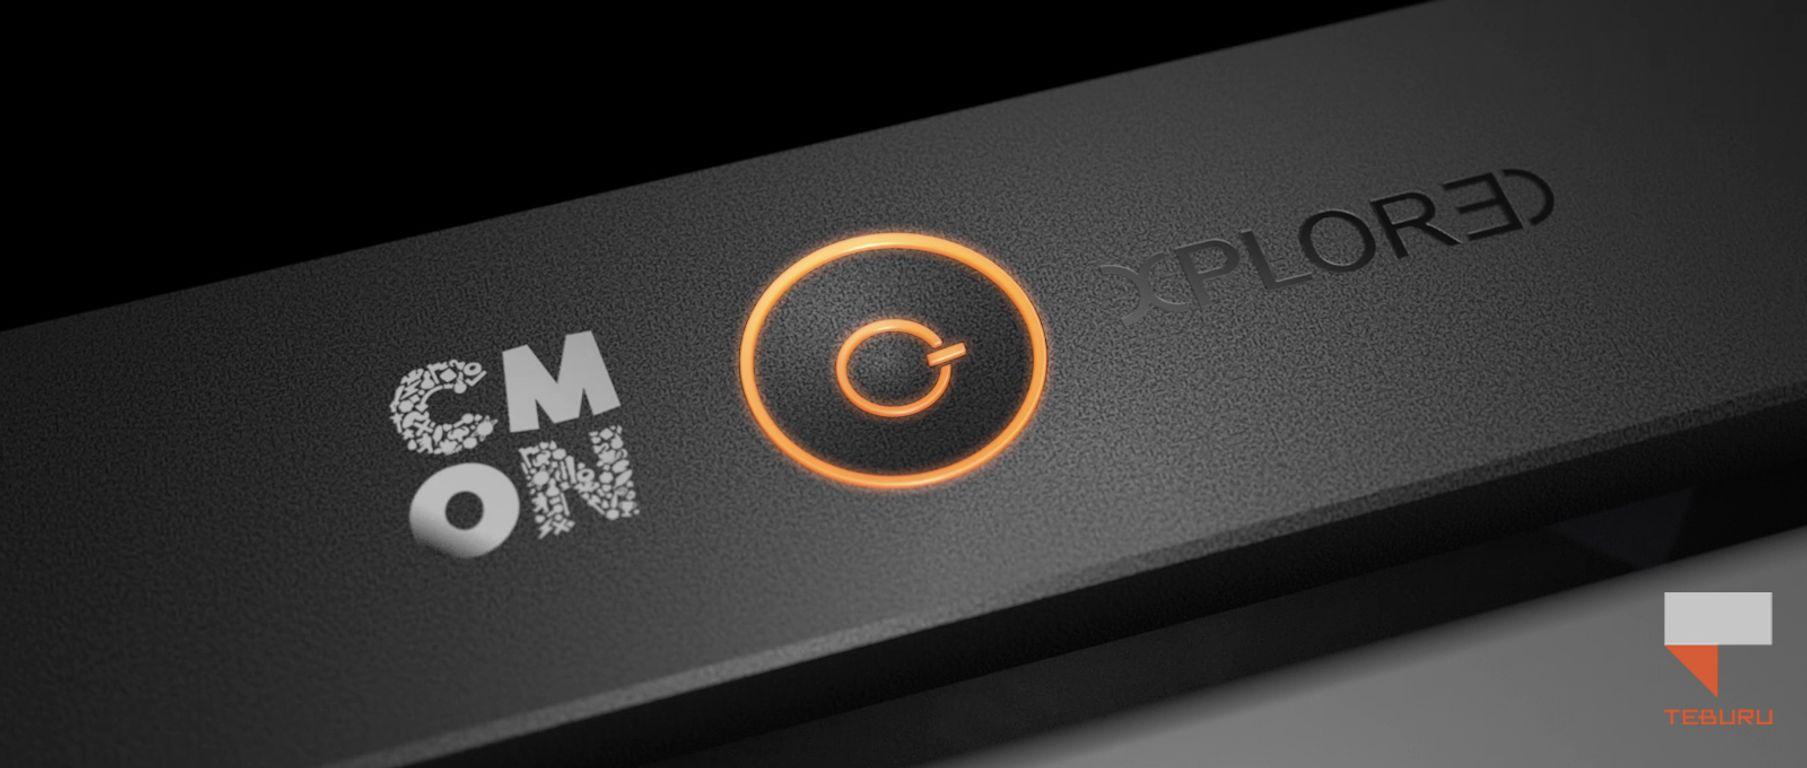 CMON+wants+to+revolutionize+board+games+with+Teburu